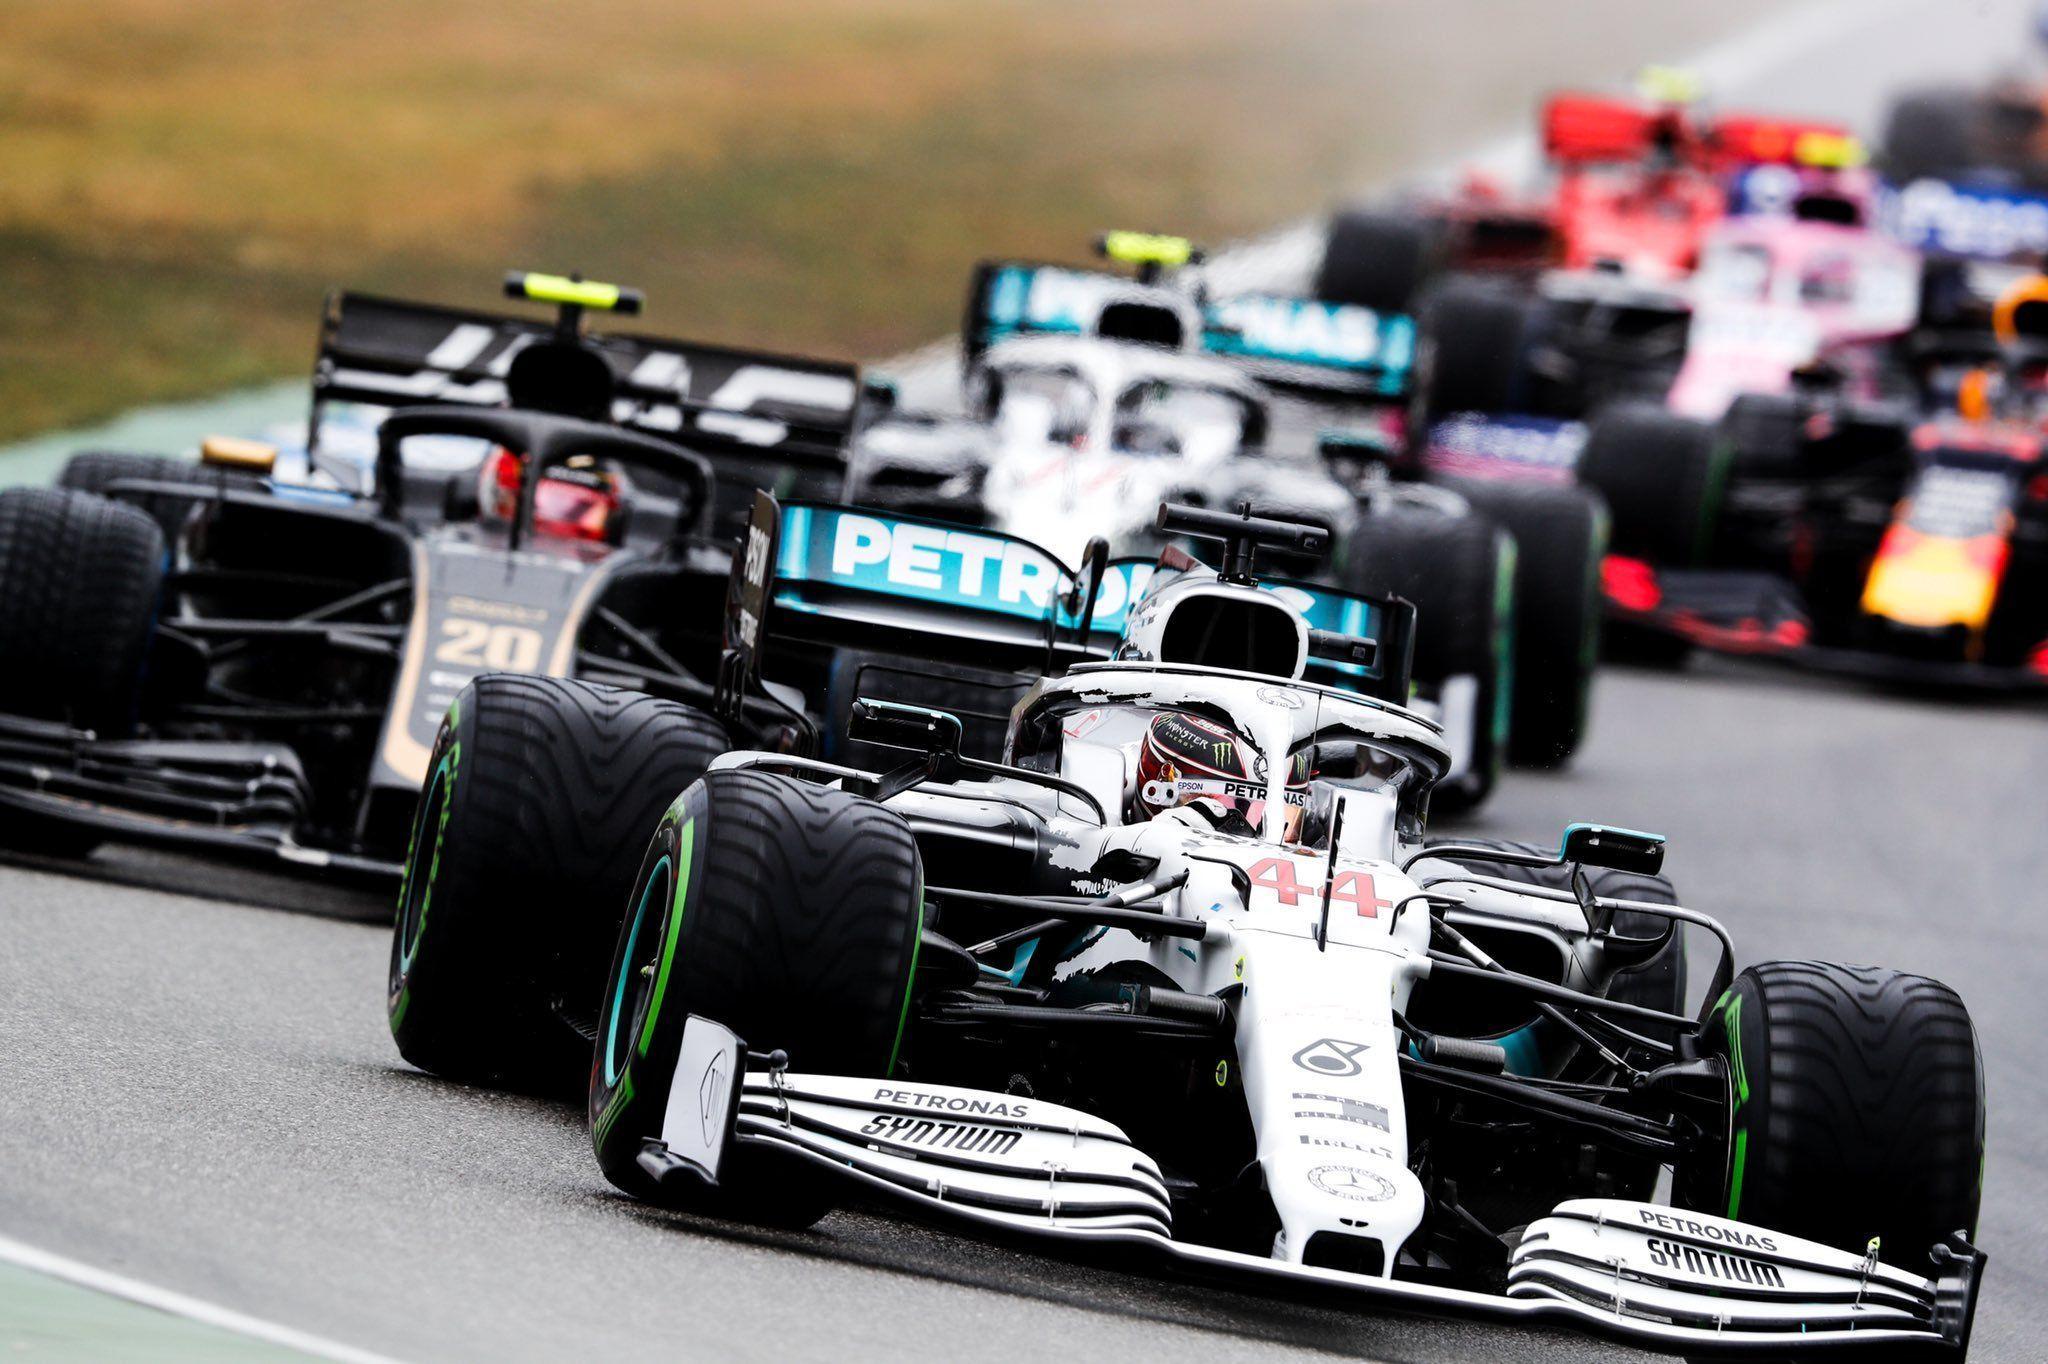 Mercedes, Lewis Hamilton's